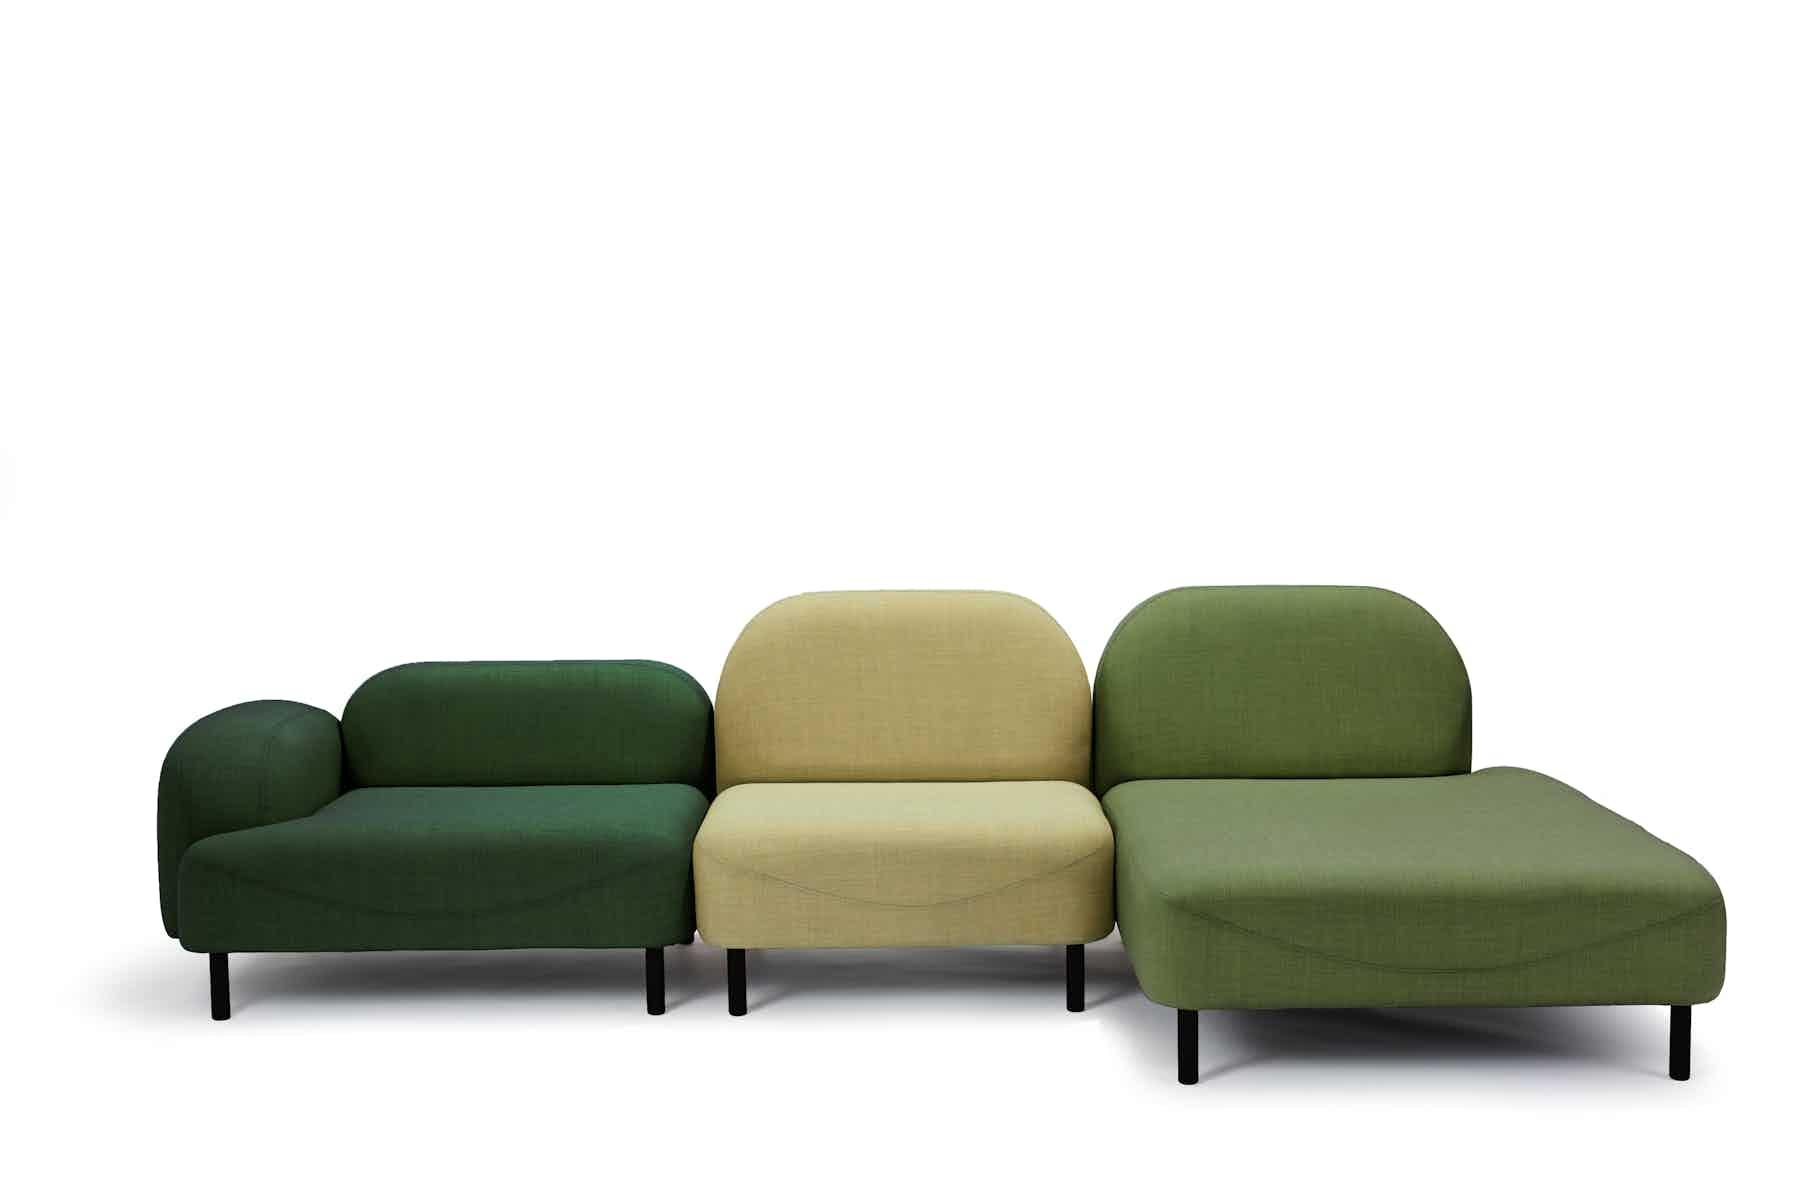 Deadgood-scafell-modular-sofa-greens-haute-living